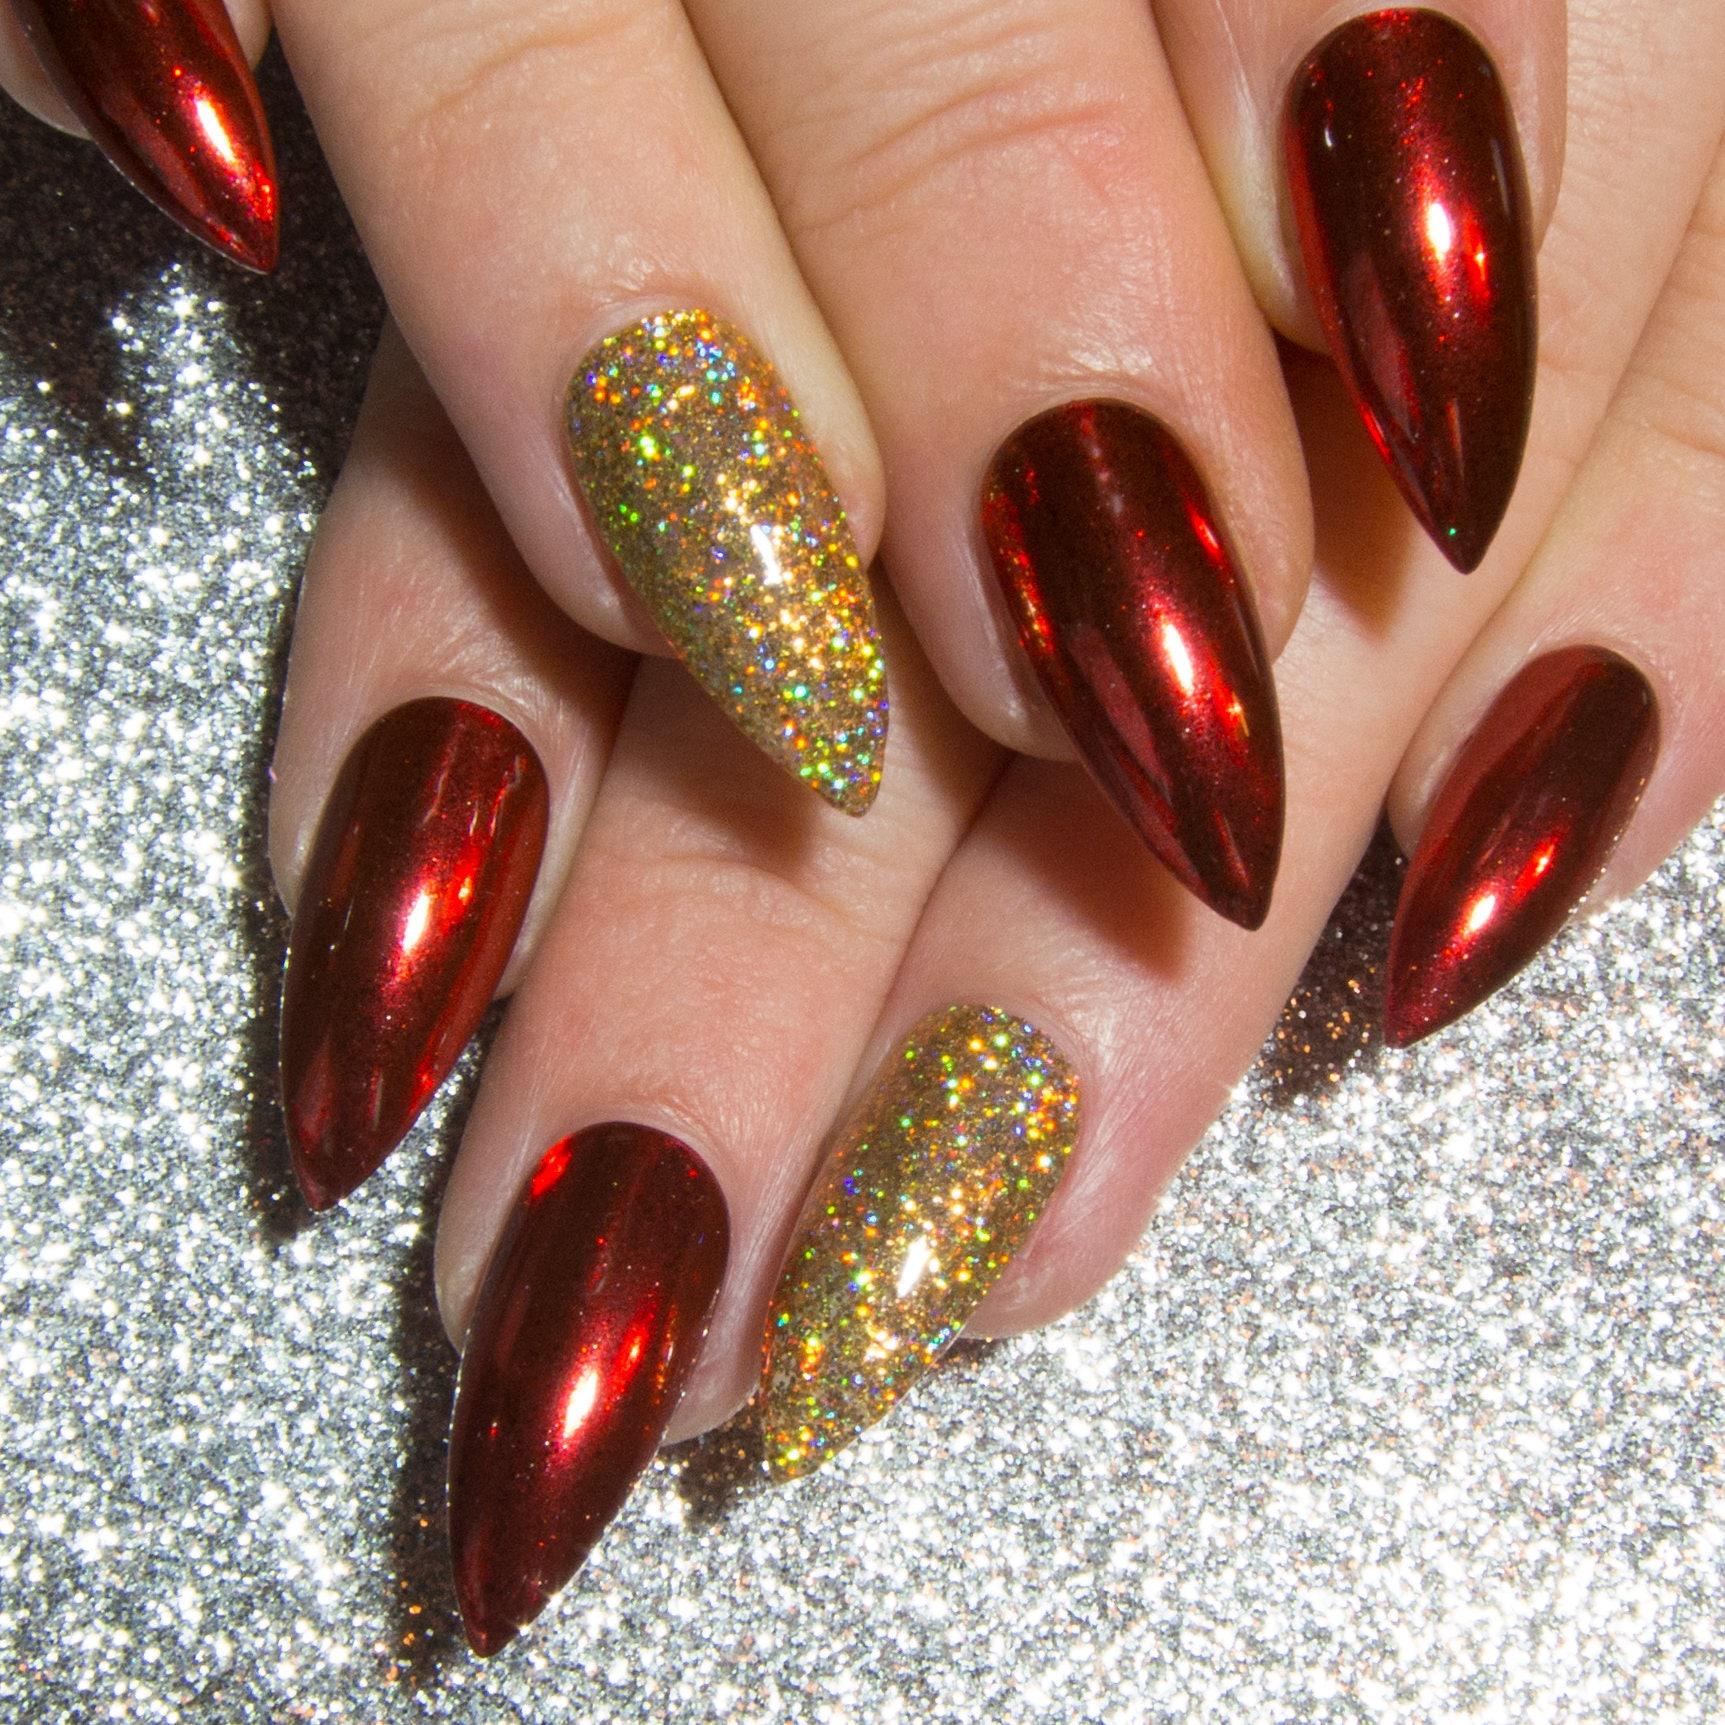 False Nails: Red Chrome Nails Stiletto Fake Nails Christmas False Nails